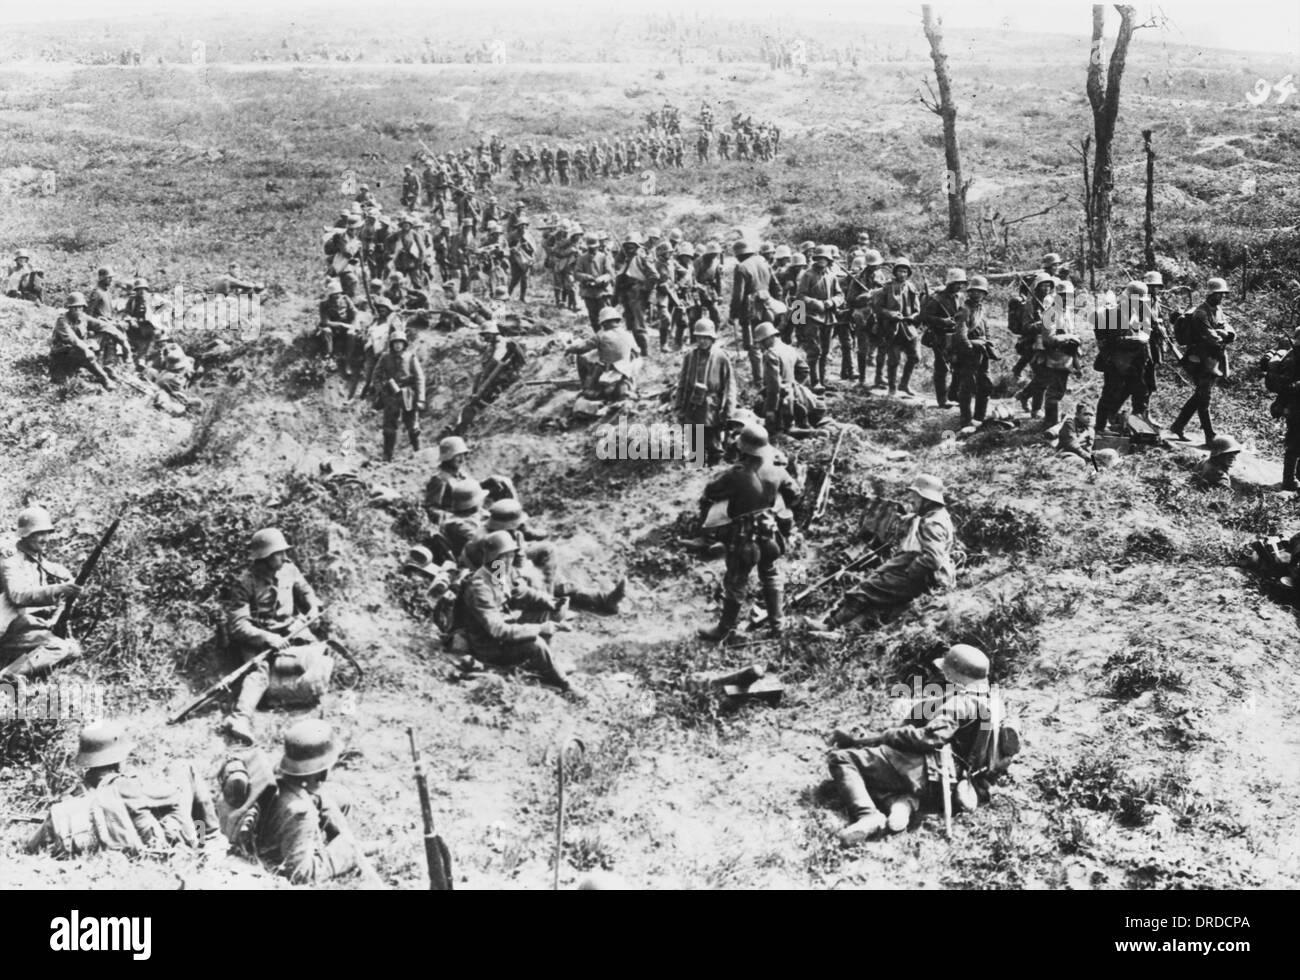 soissons world war i stock photos soissons world war i stock